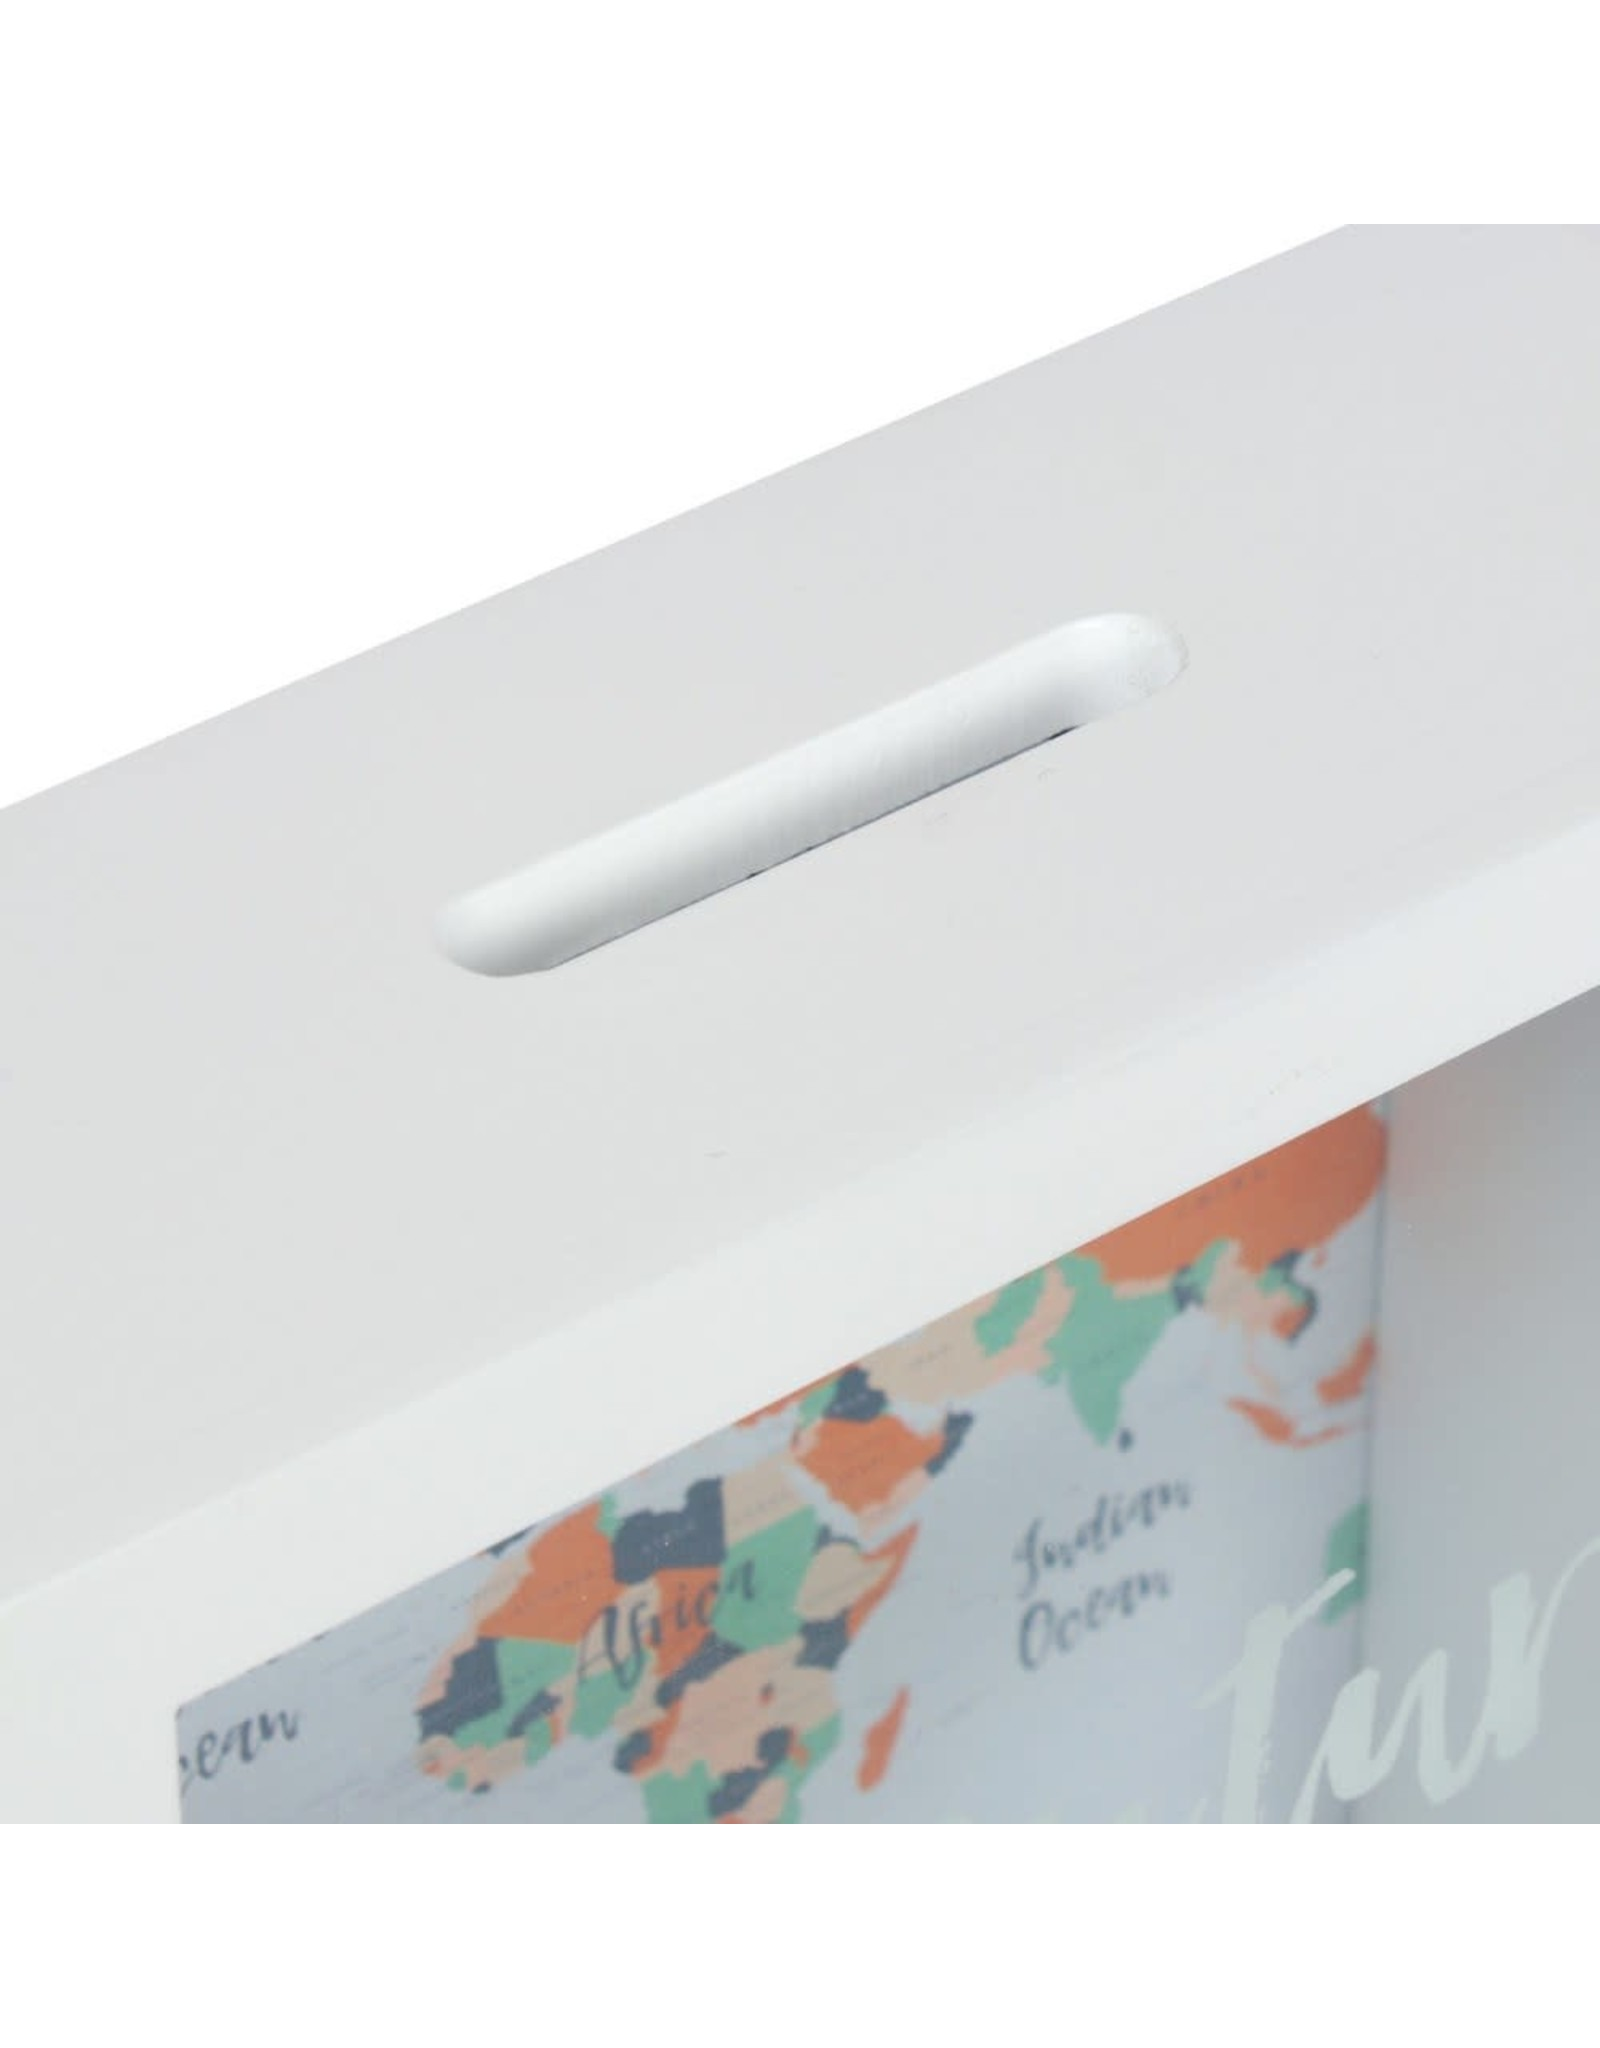 Jones Home & Gift moneybox - adventure fund